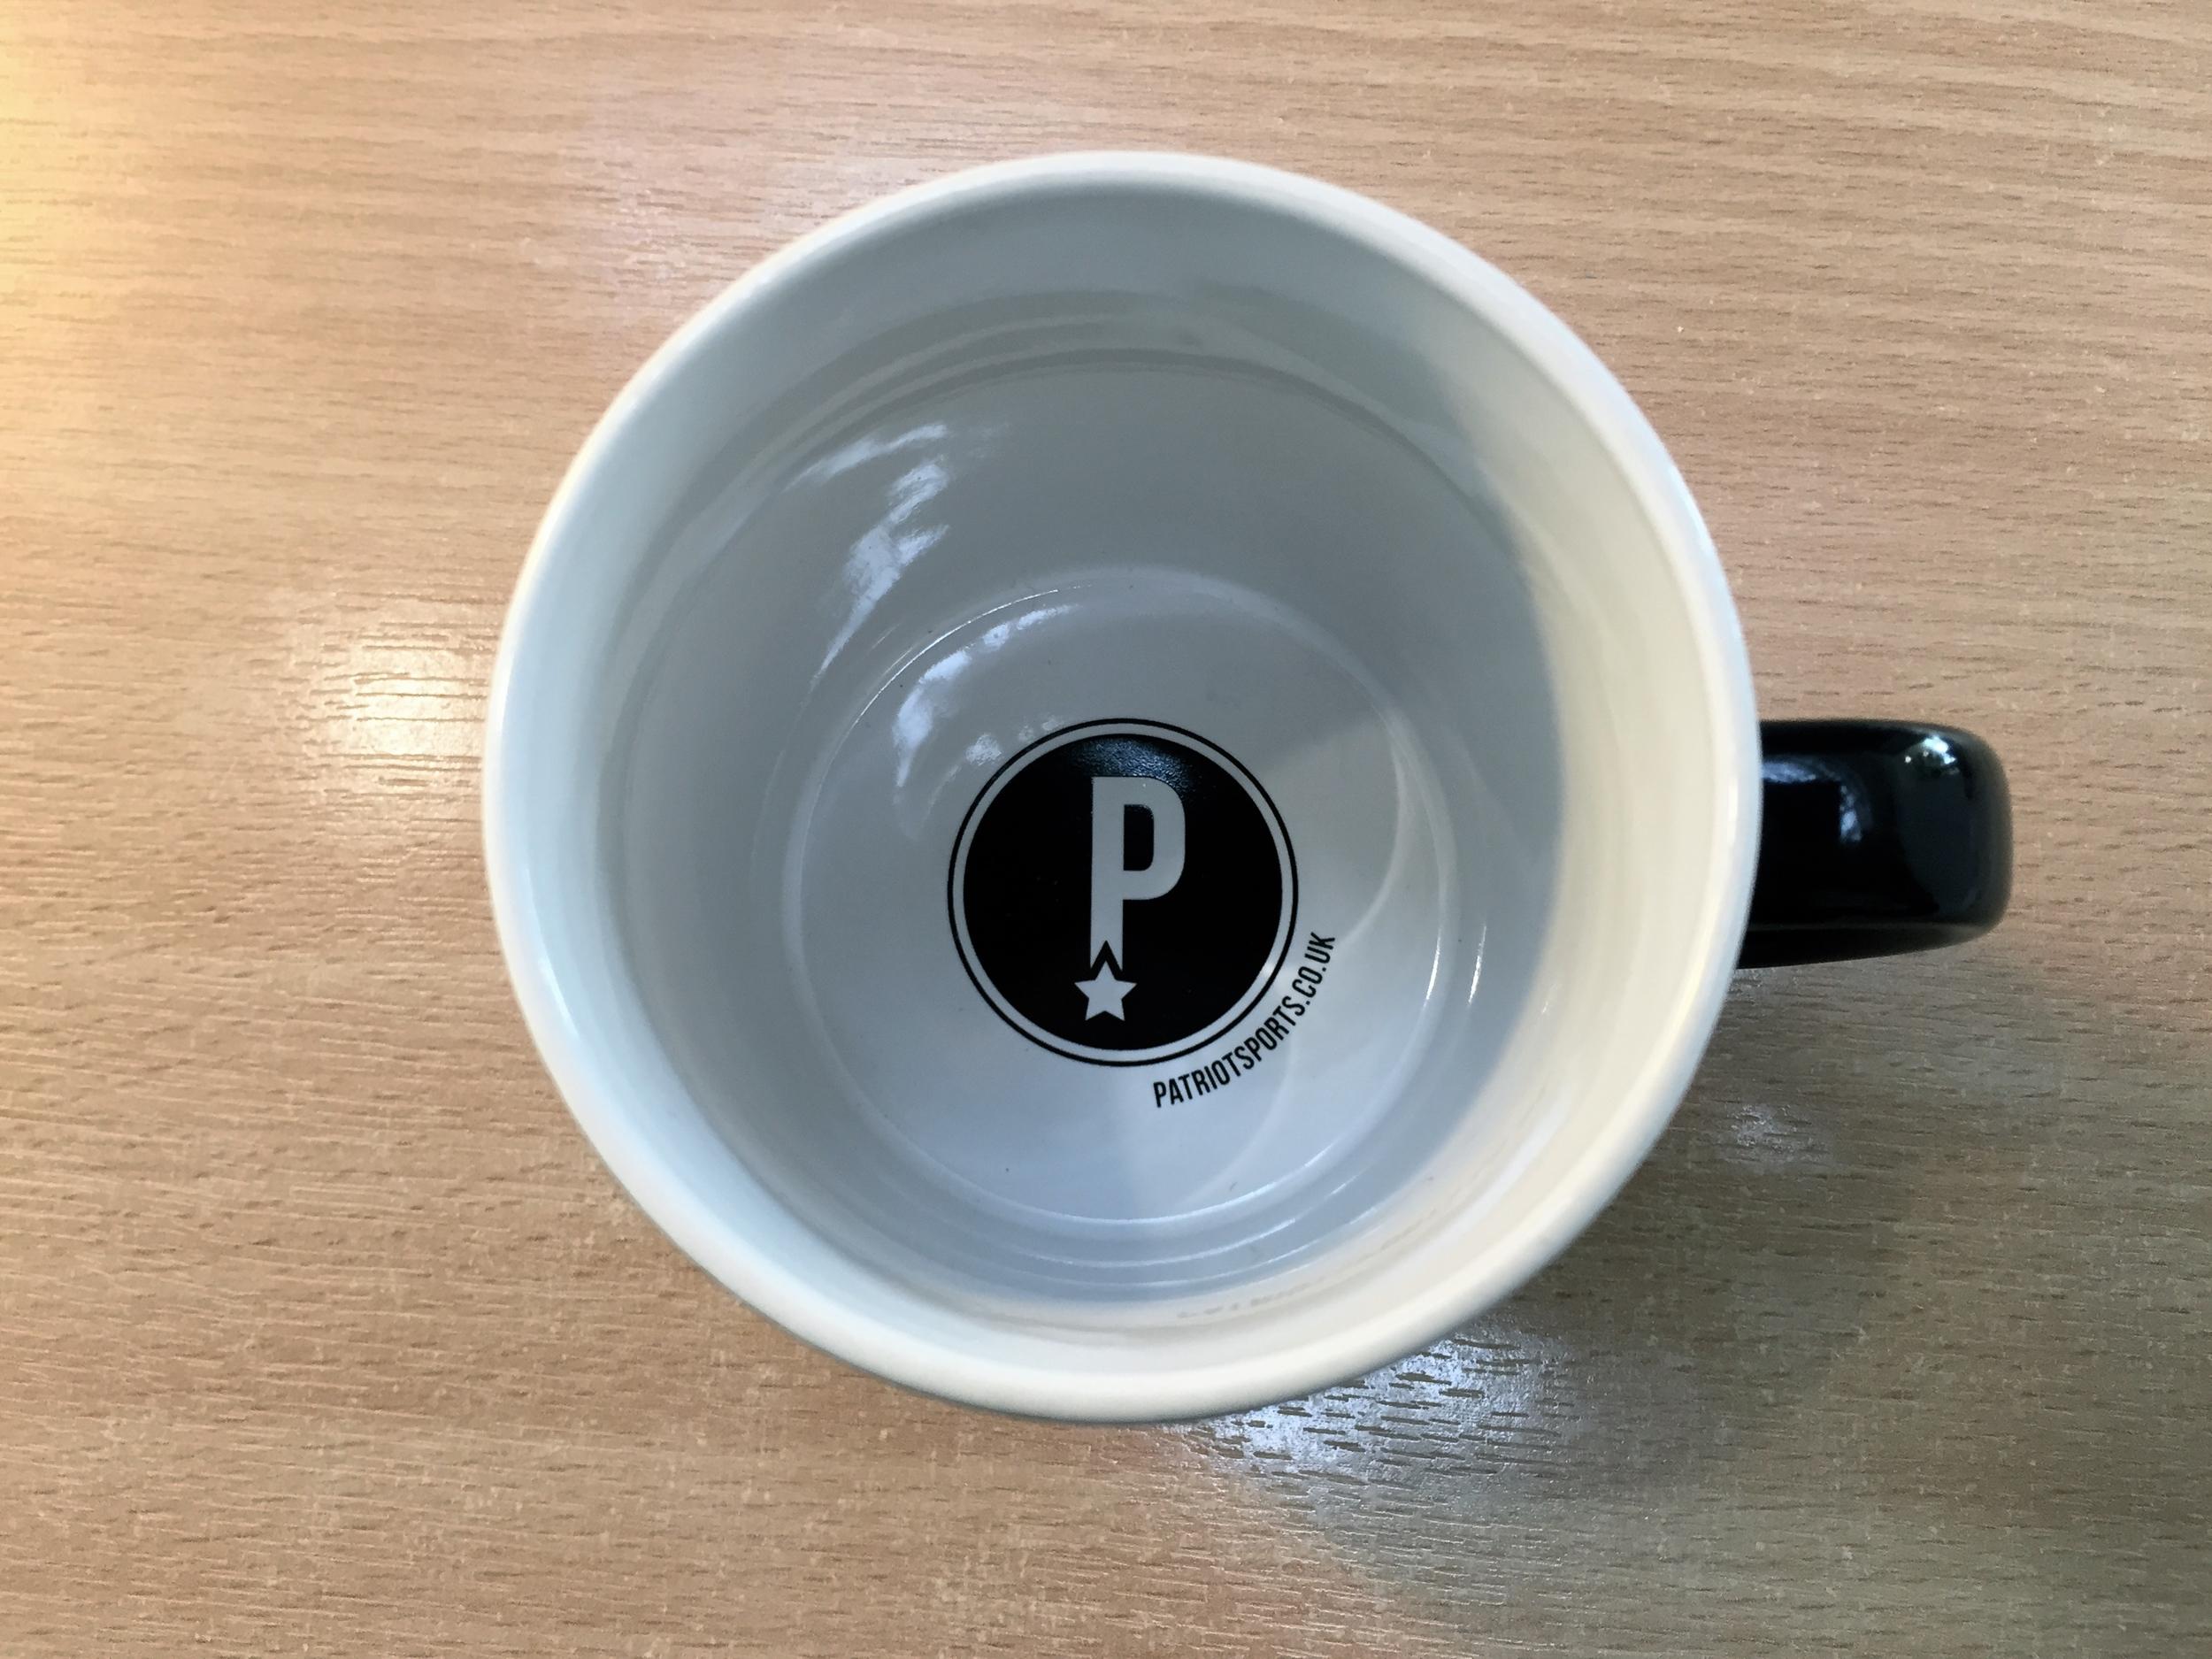 Team Patriot Coffee Mug (Inside)